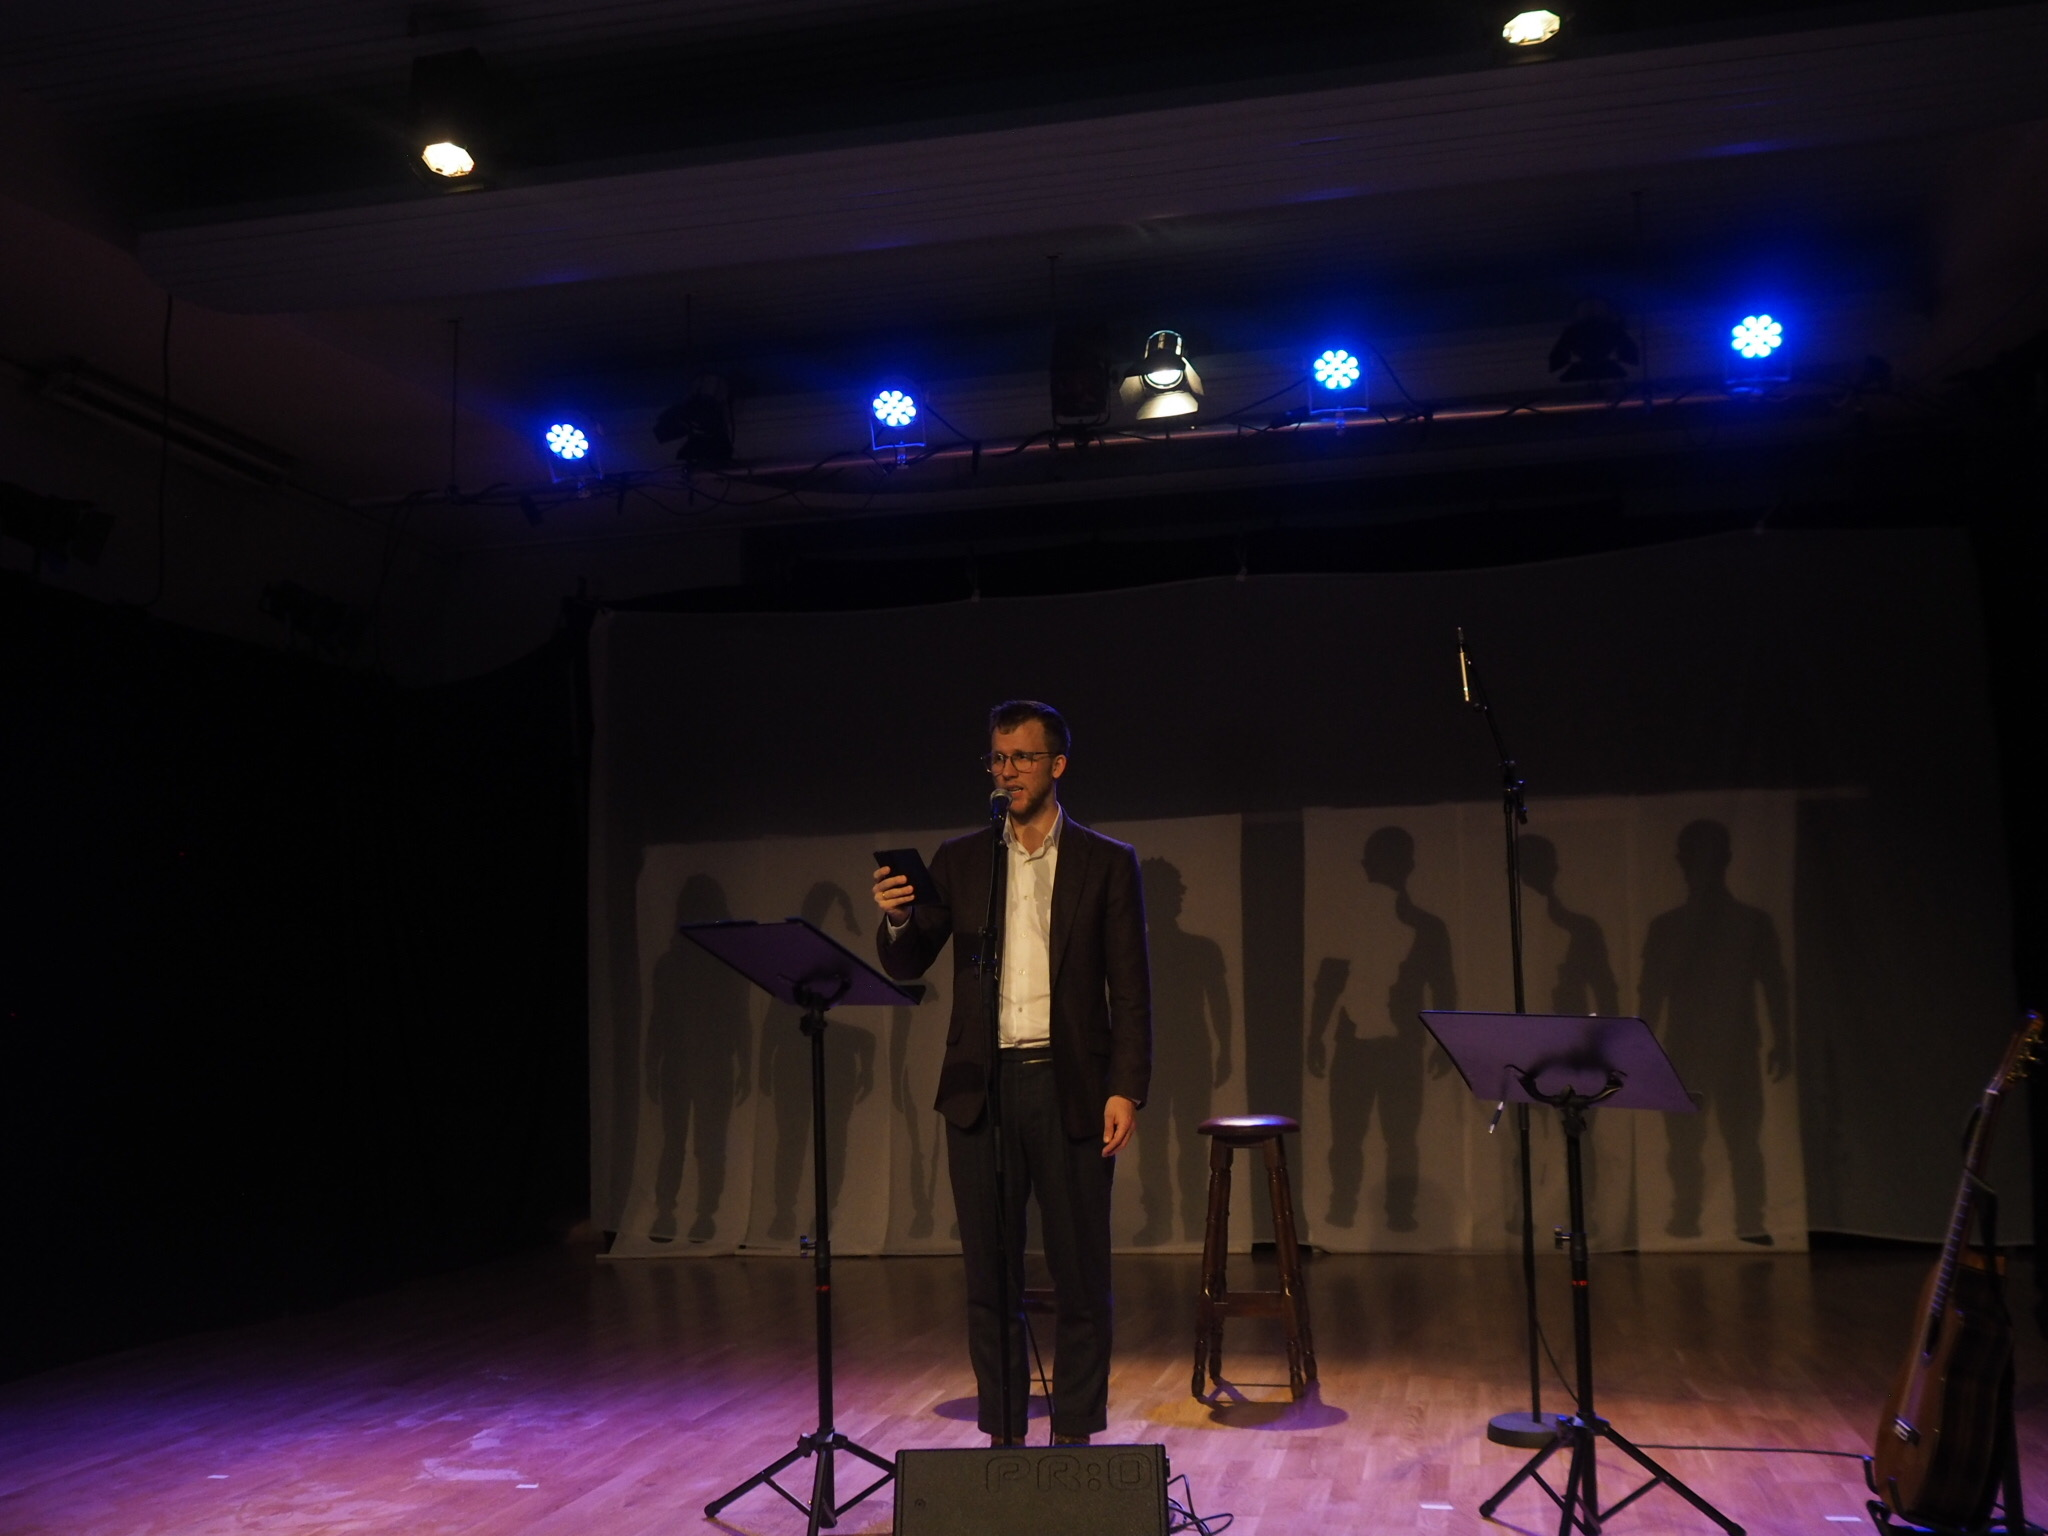 Reading: Four poems by Remi Kanazi